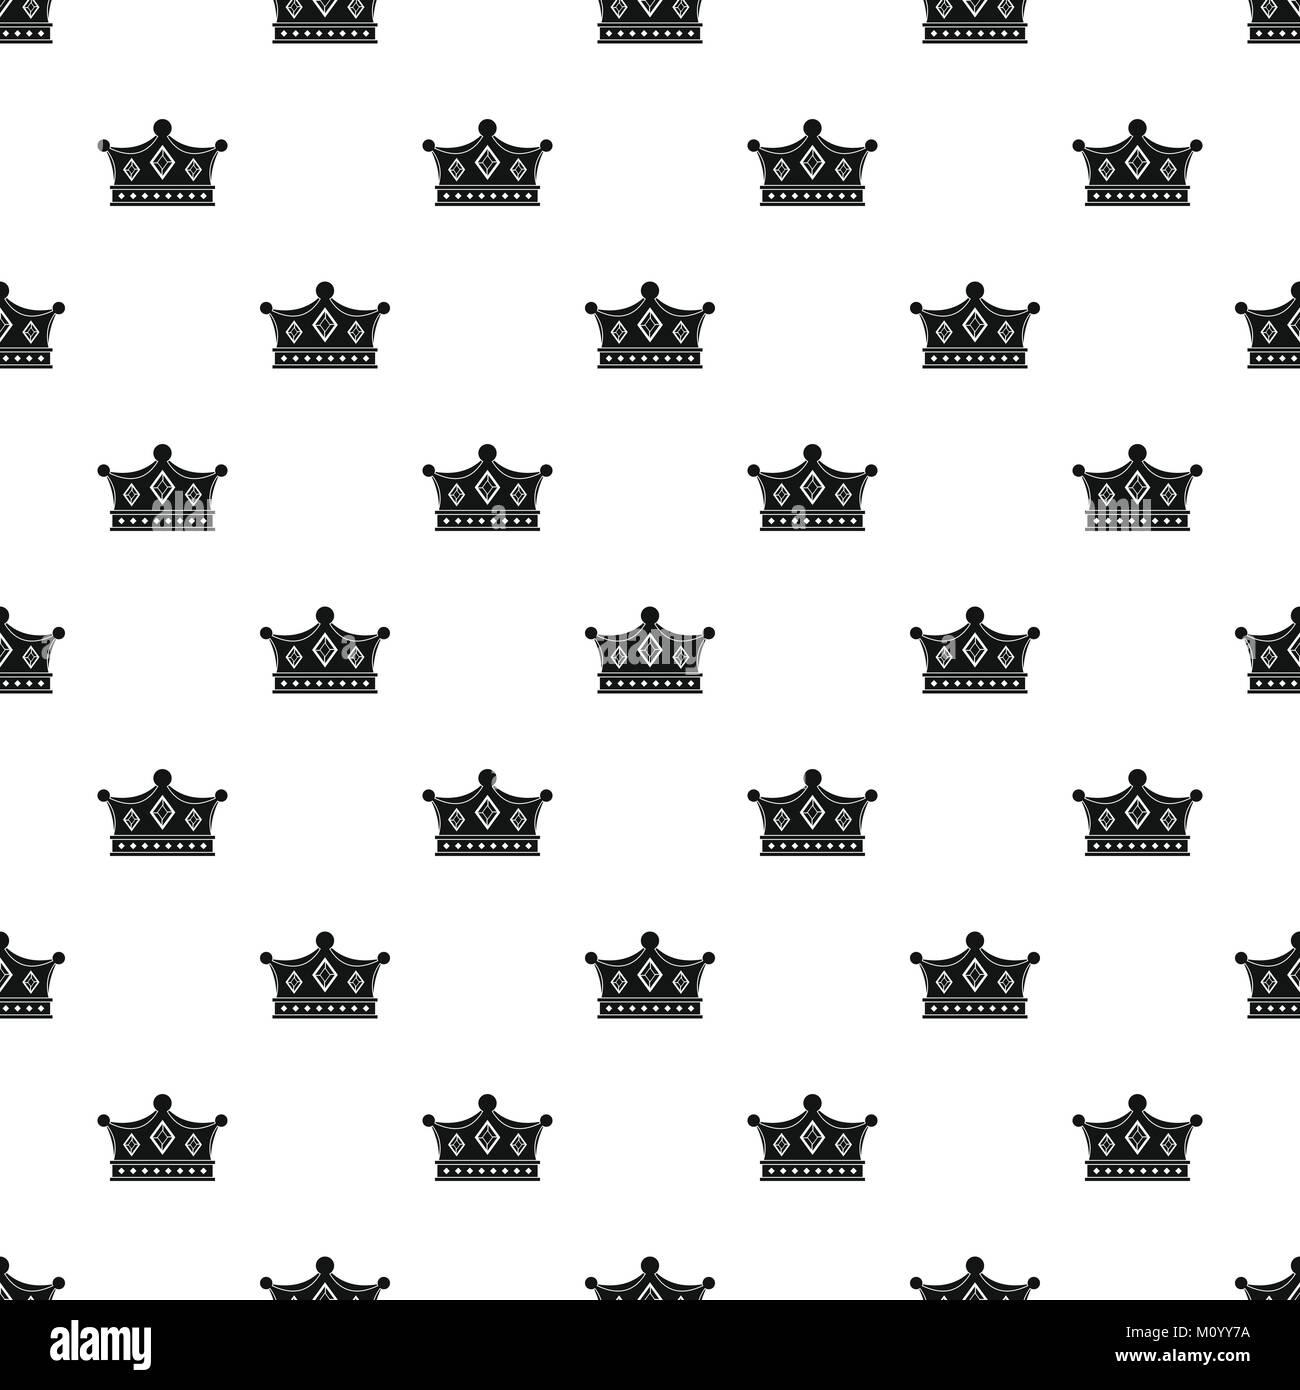 Monarchy crown pattern vector - Stock Vector